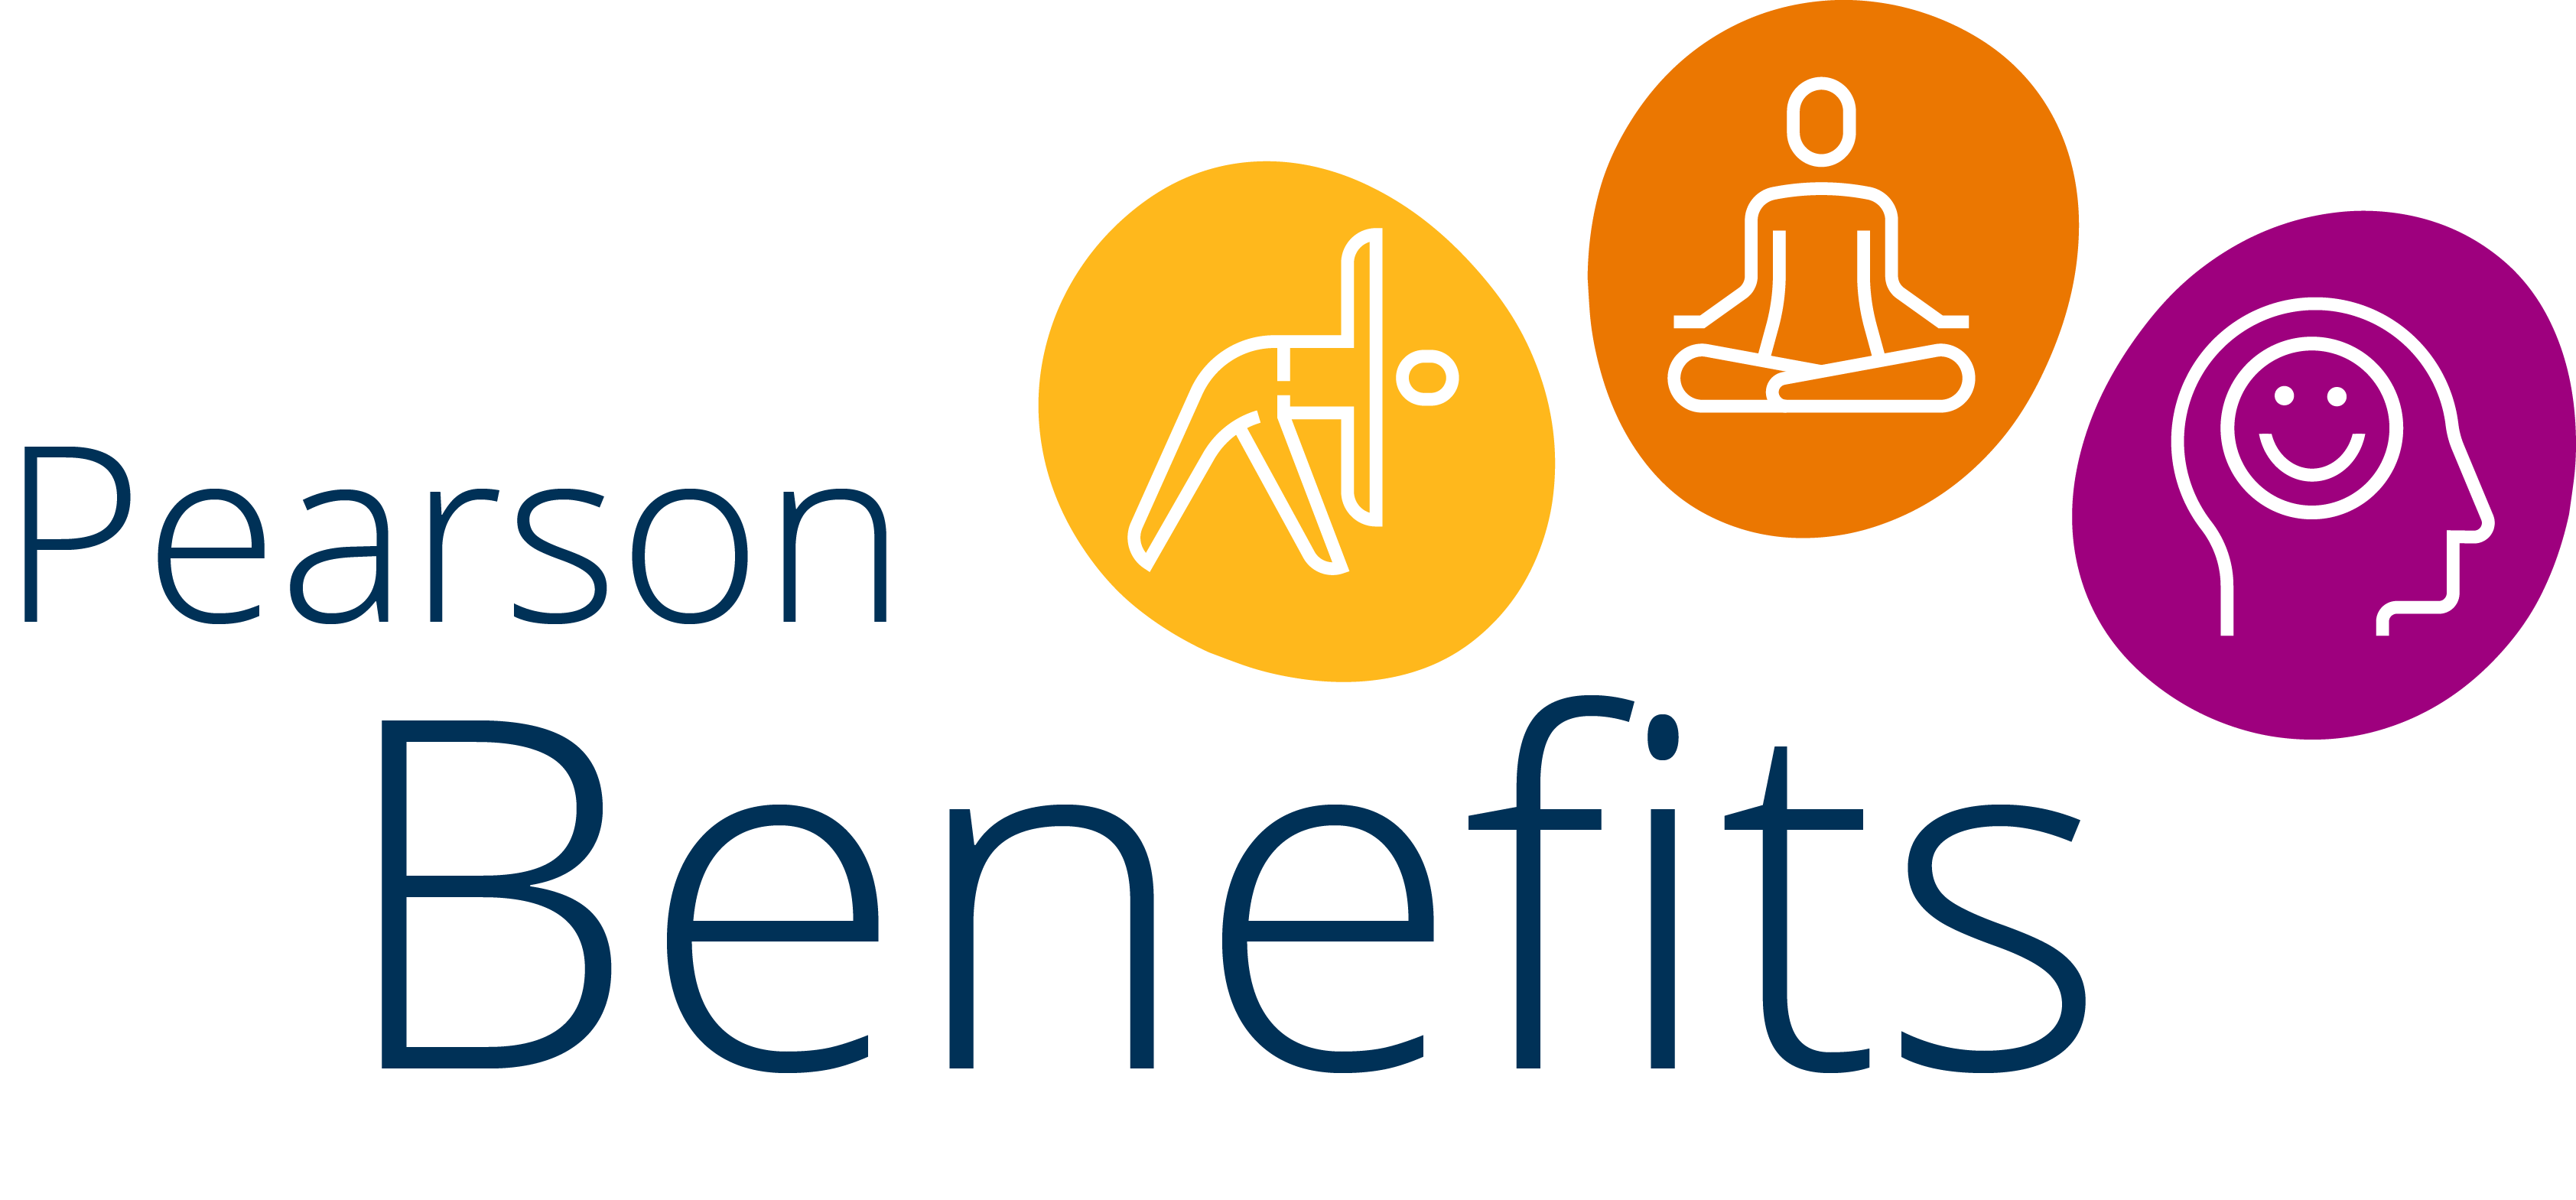 Pearson Benefits